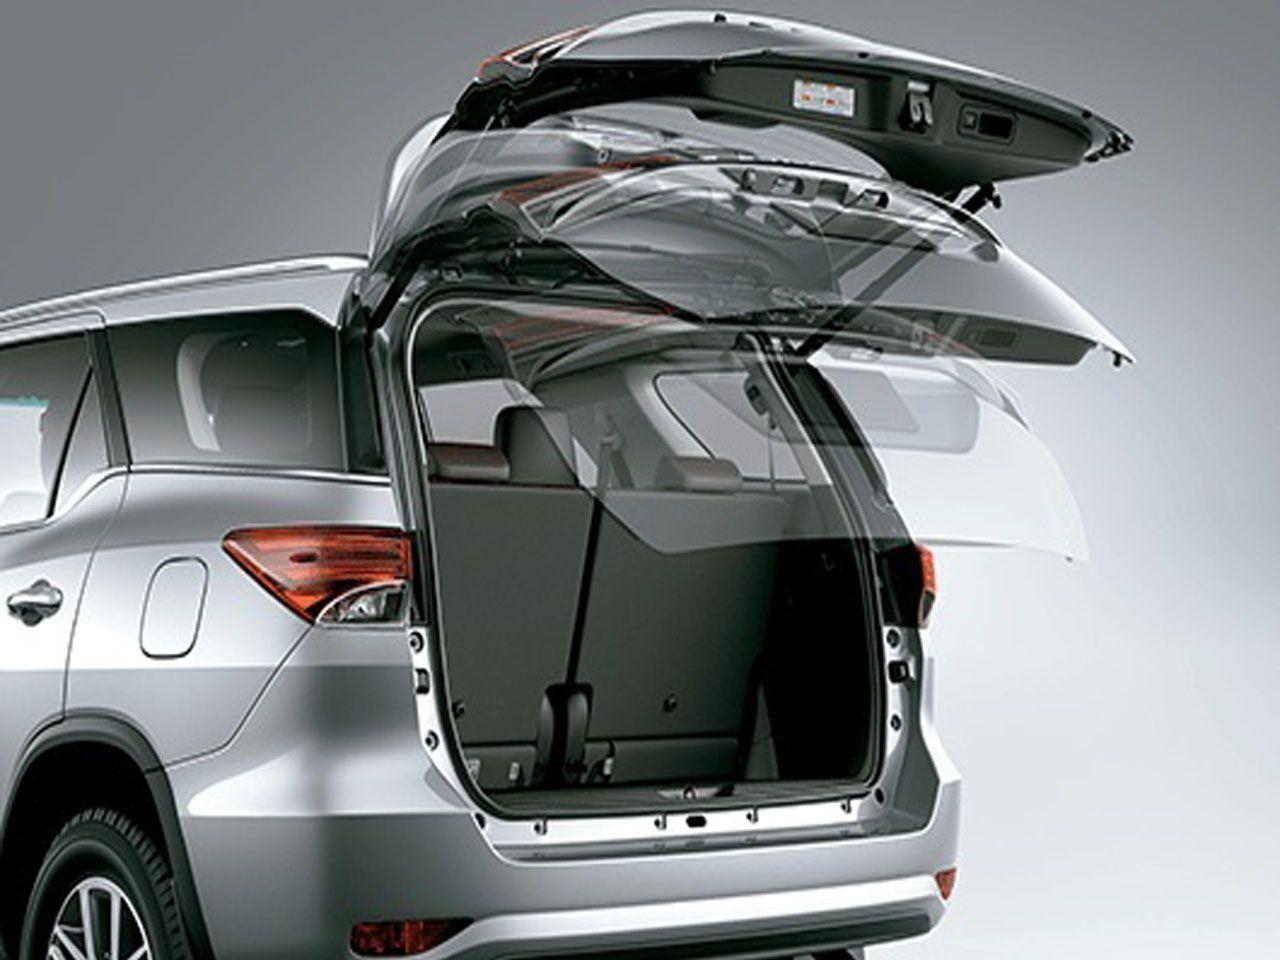 Sensor de Abertura do Porta-Malas Branco SW4 SRX  - Mirai Peças Toyota